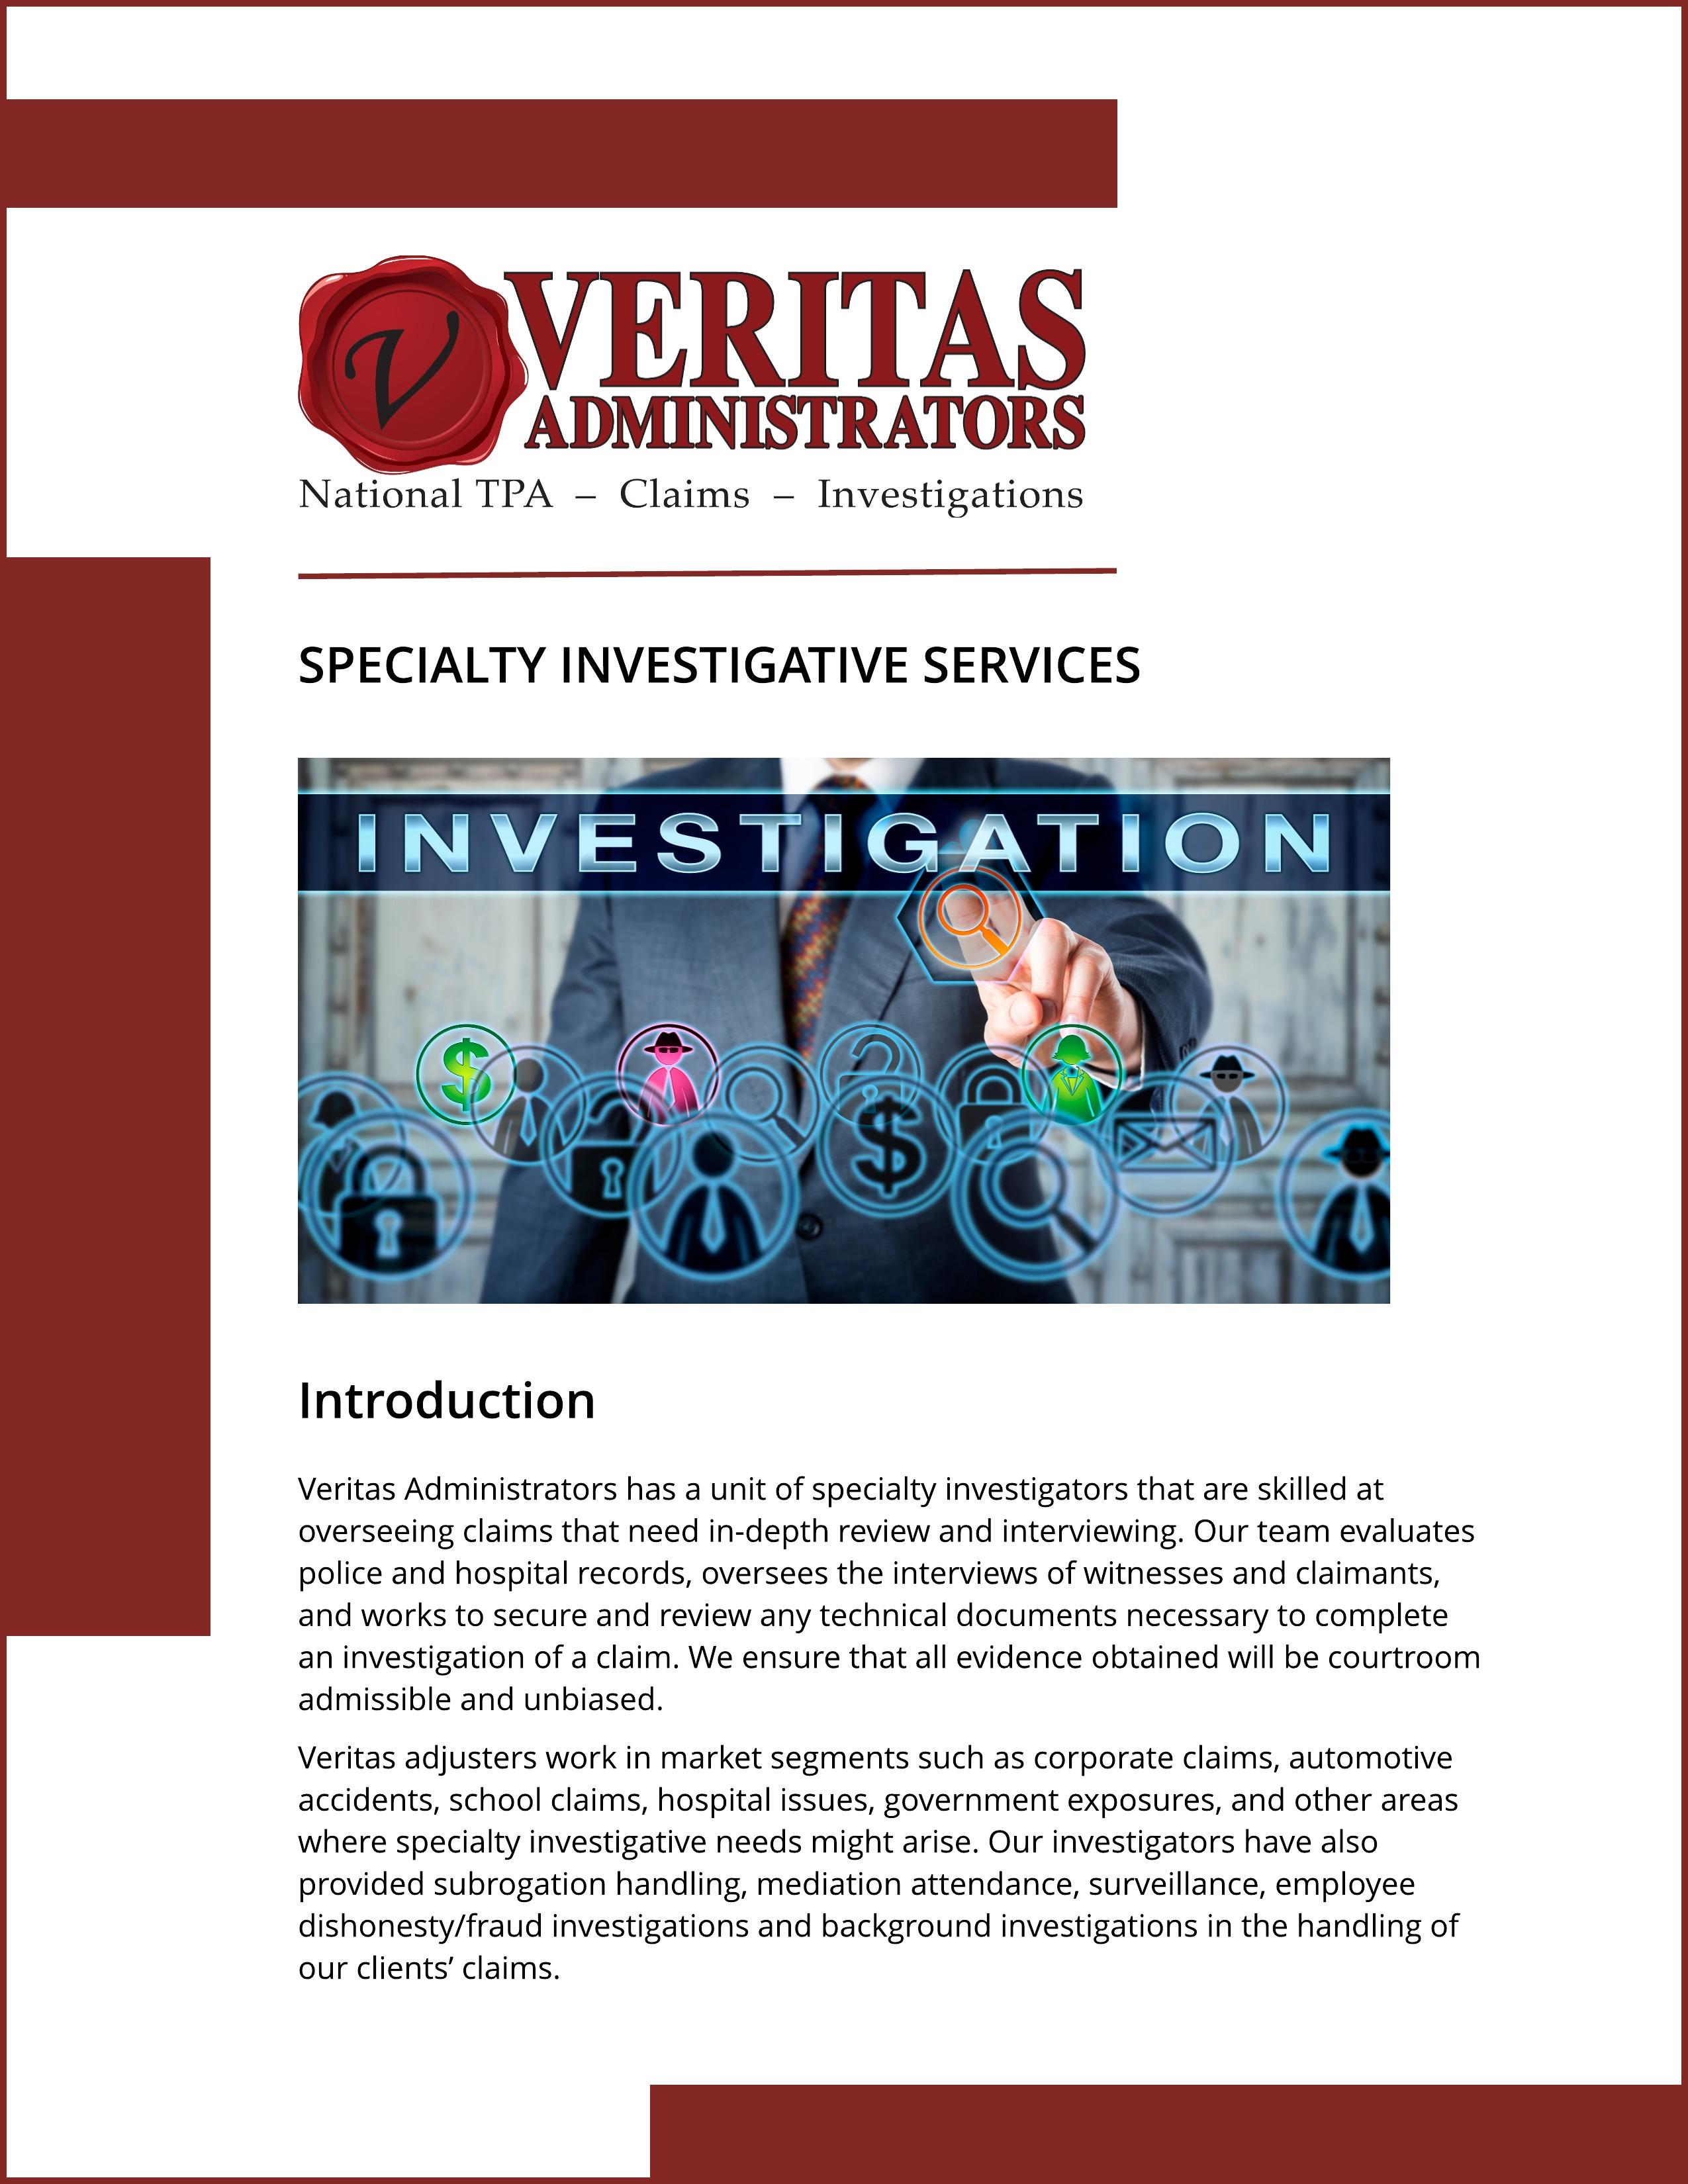 Specialty Investigative Services